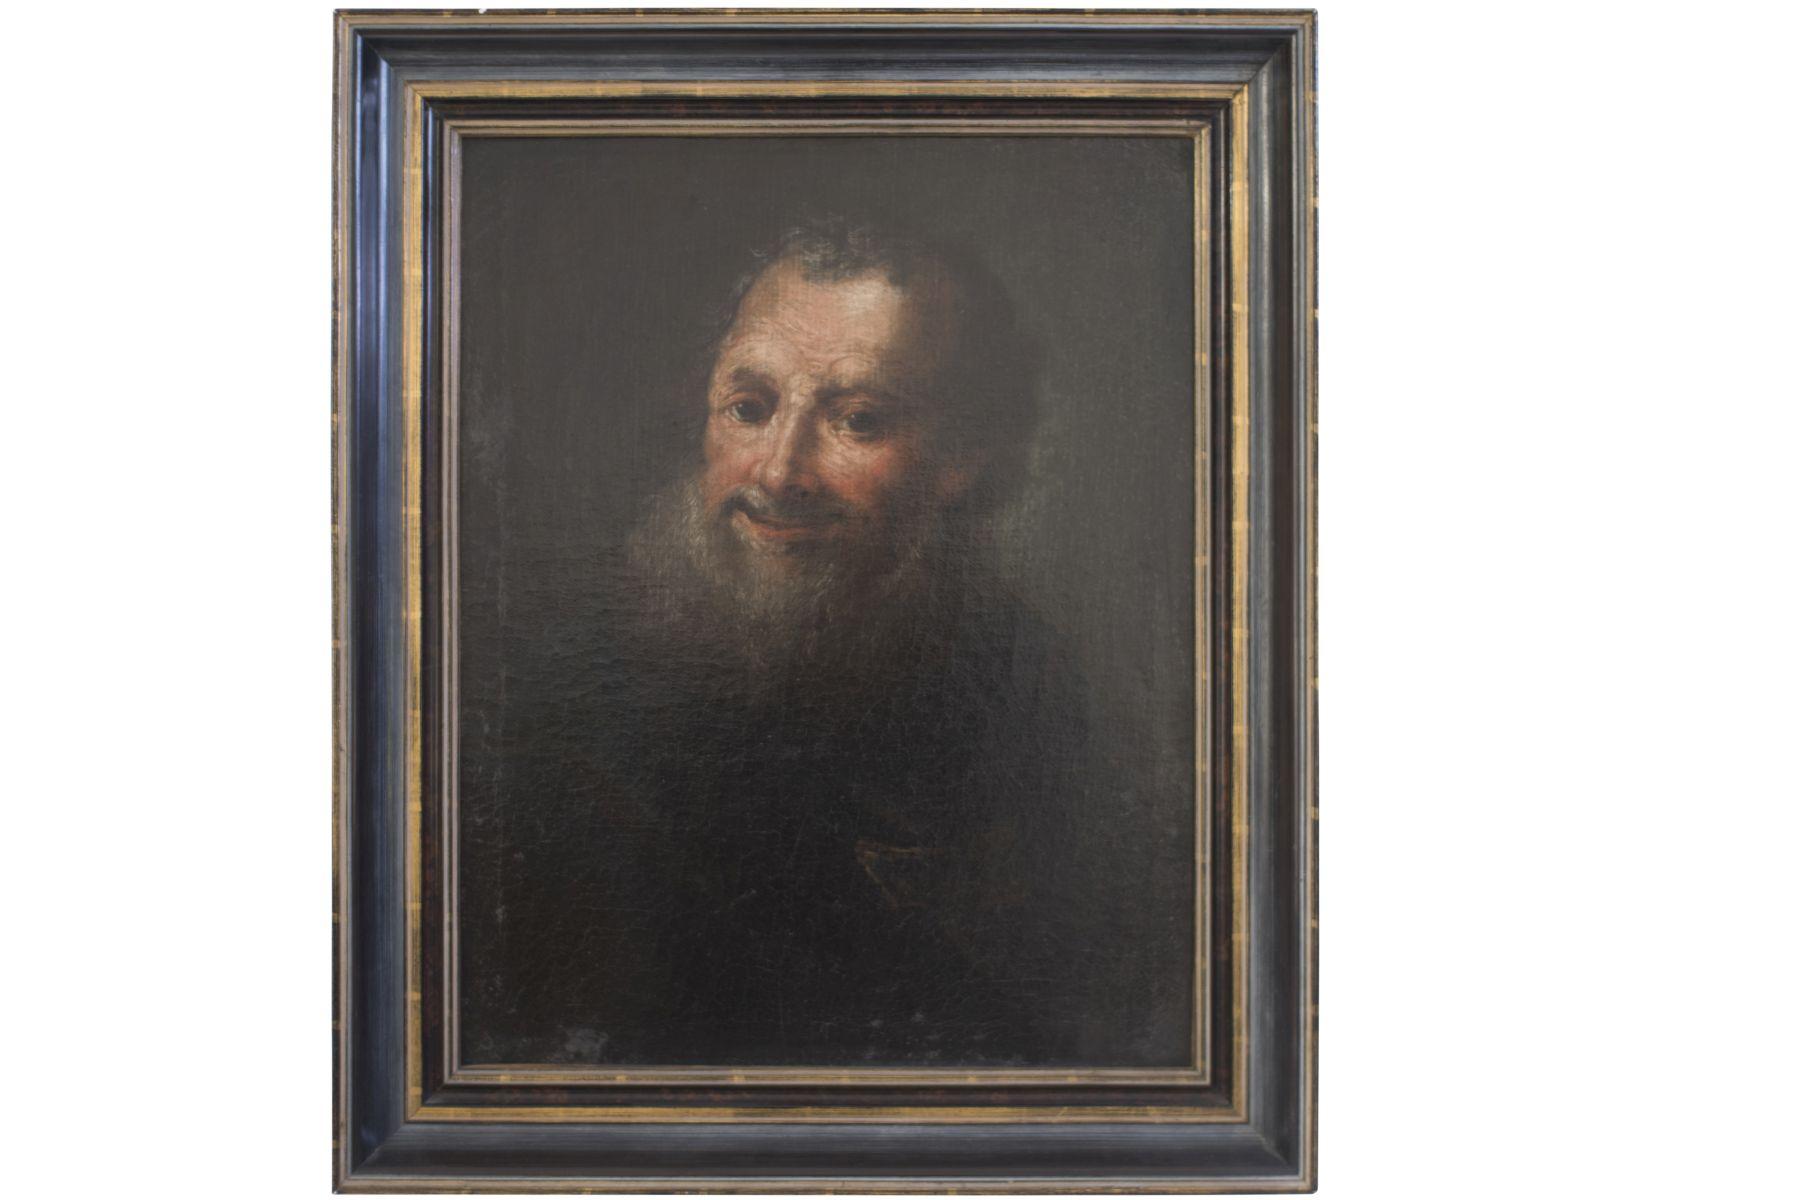 "#20 Historism painter around 1850 ""Old man with beard"" | Historismus Maler um 1850 ""Alter Mann mit Bart"" Image"